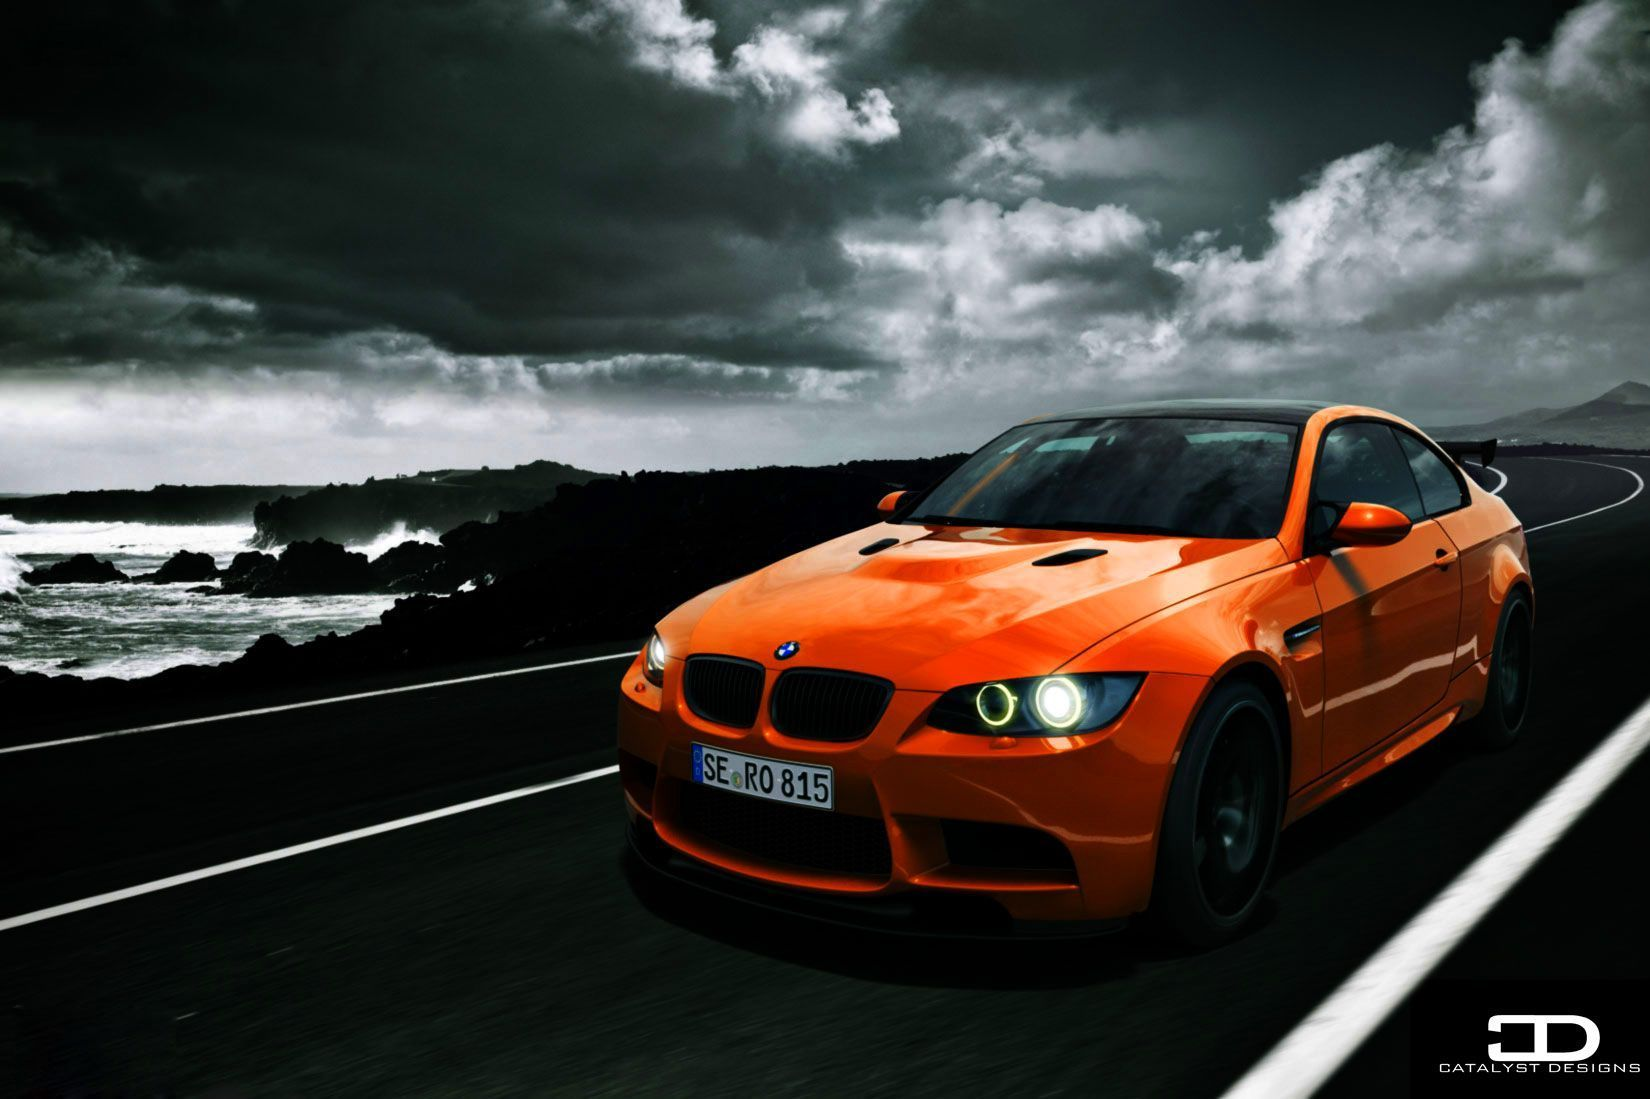 BMW Schnitzer Engine HD Wide Wallpaper For Widescreen Wallpapers) U2013 HD  Wallpapers